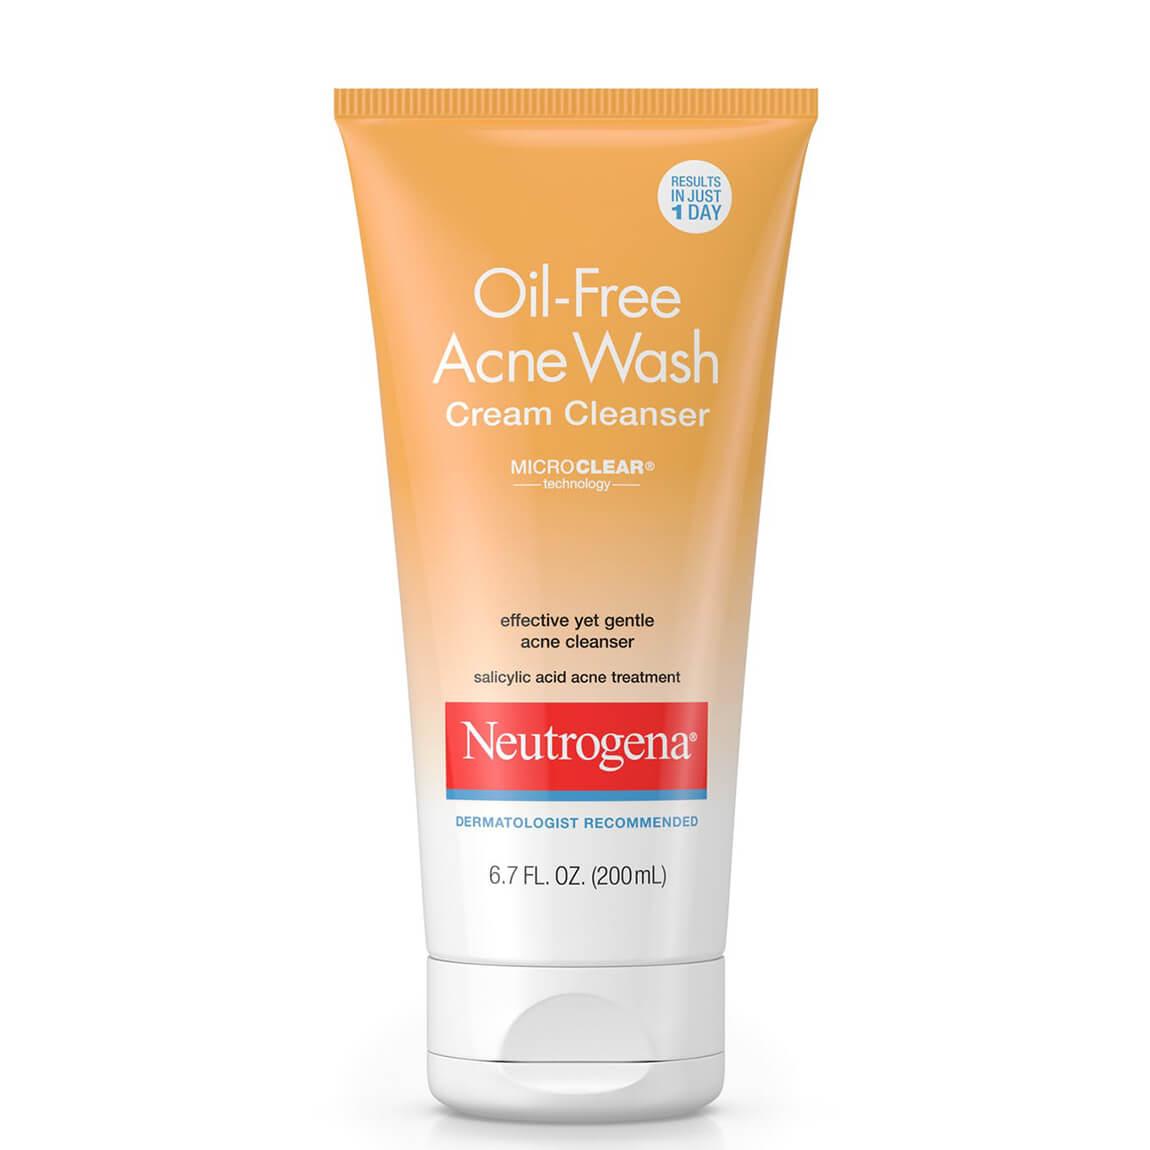 Neutrogena Oil-Free Acne Face Wash Cream Cleanser 200ml